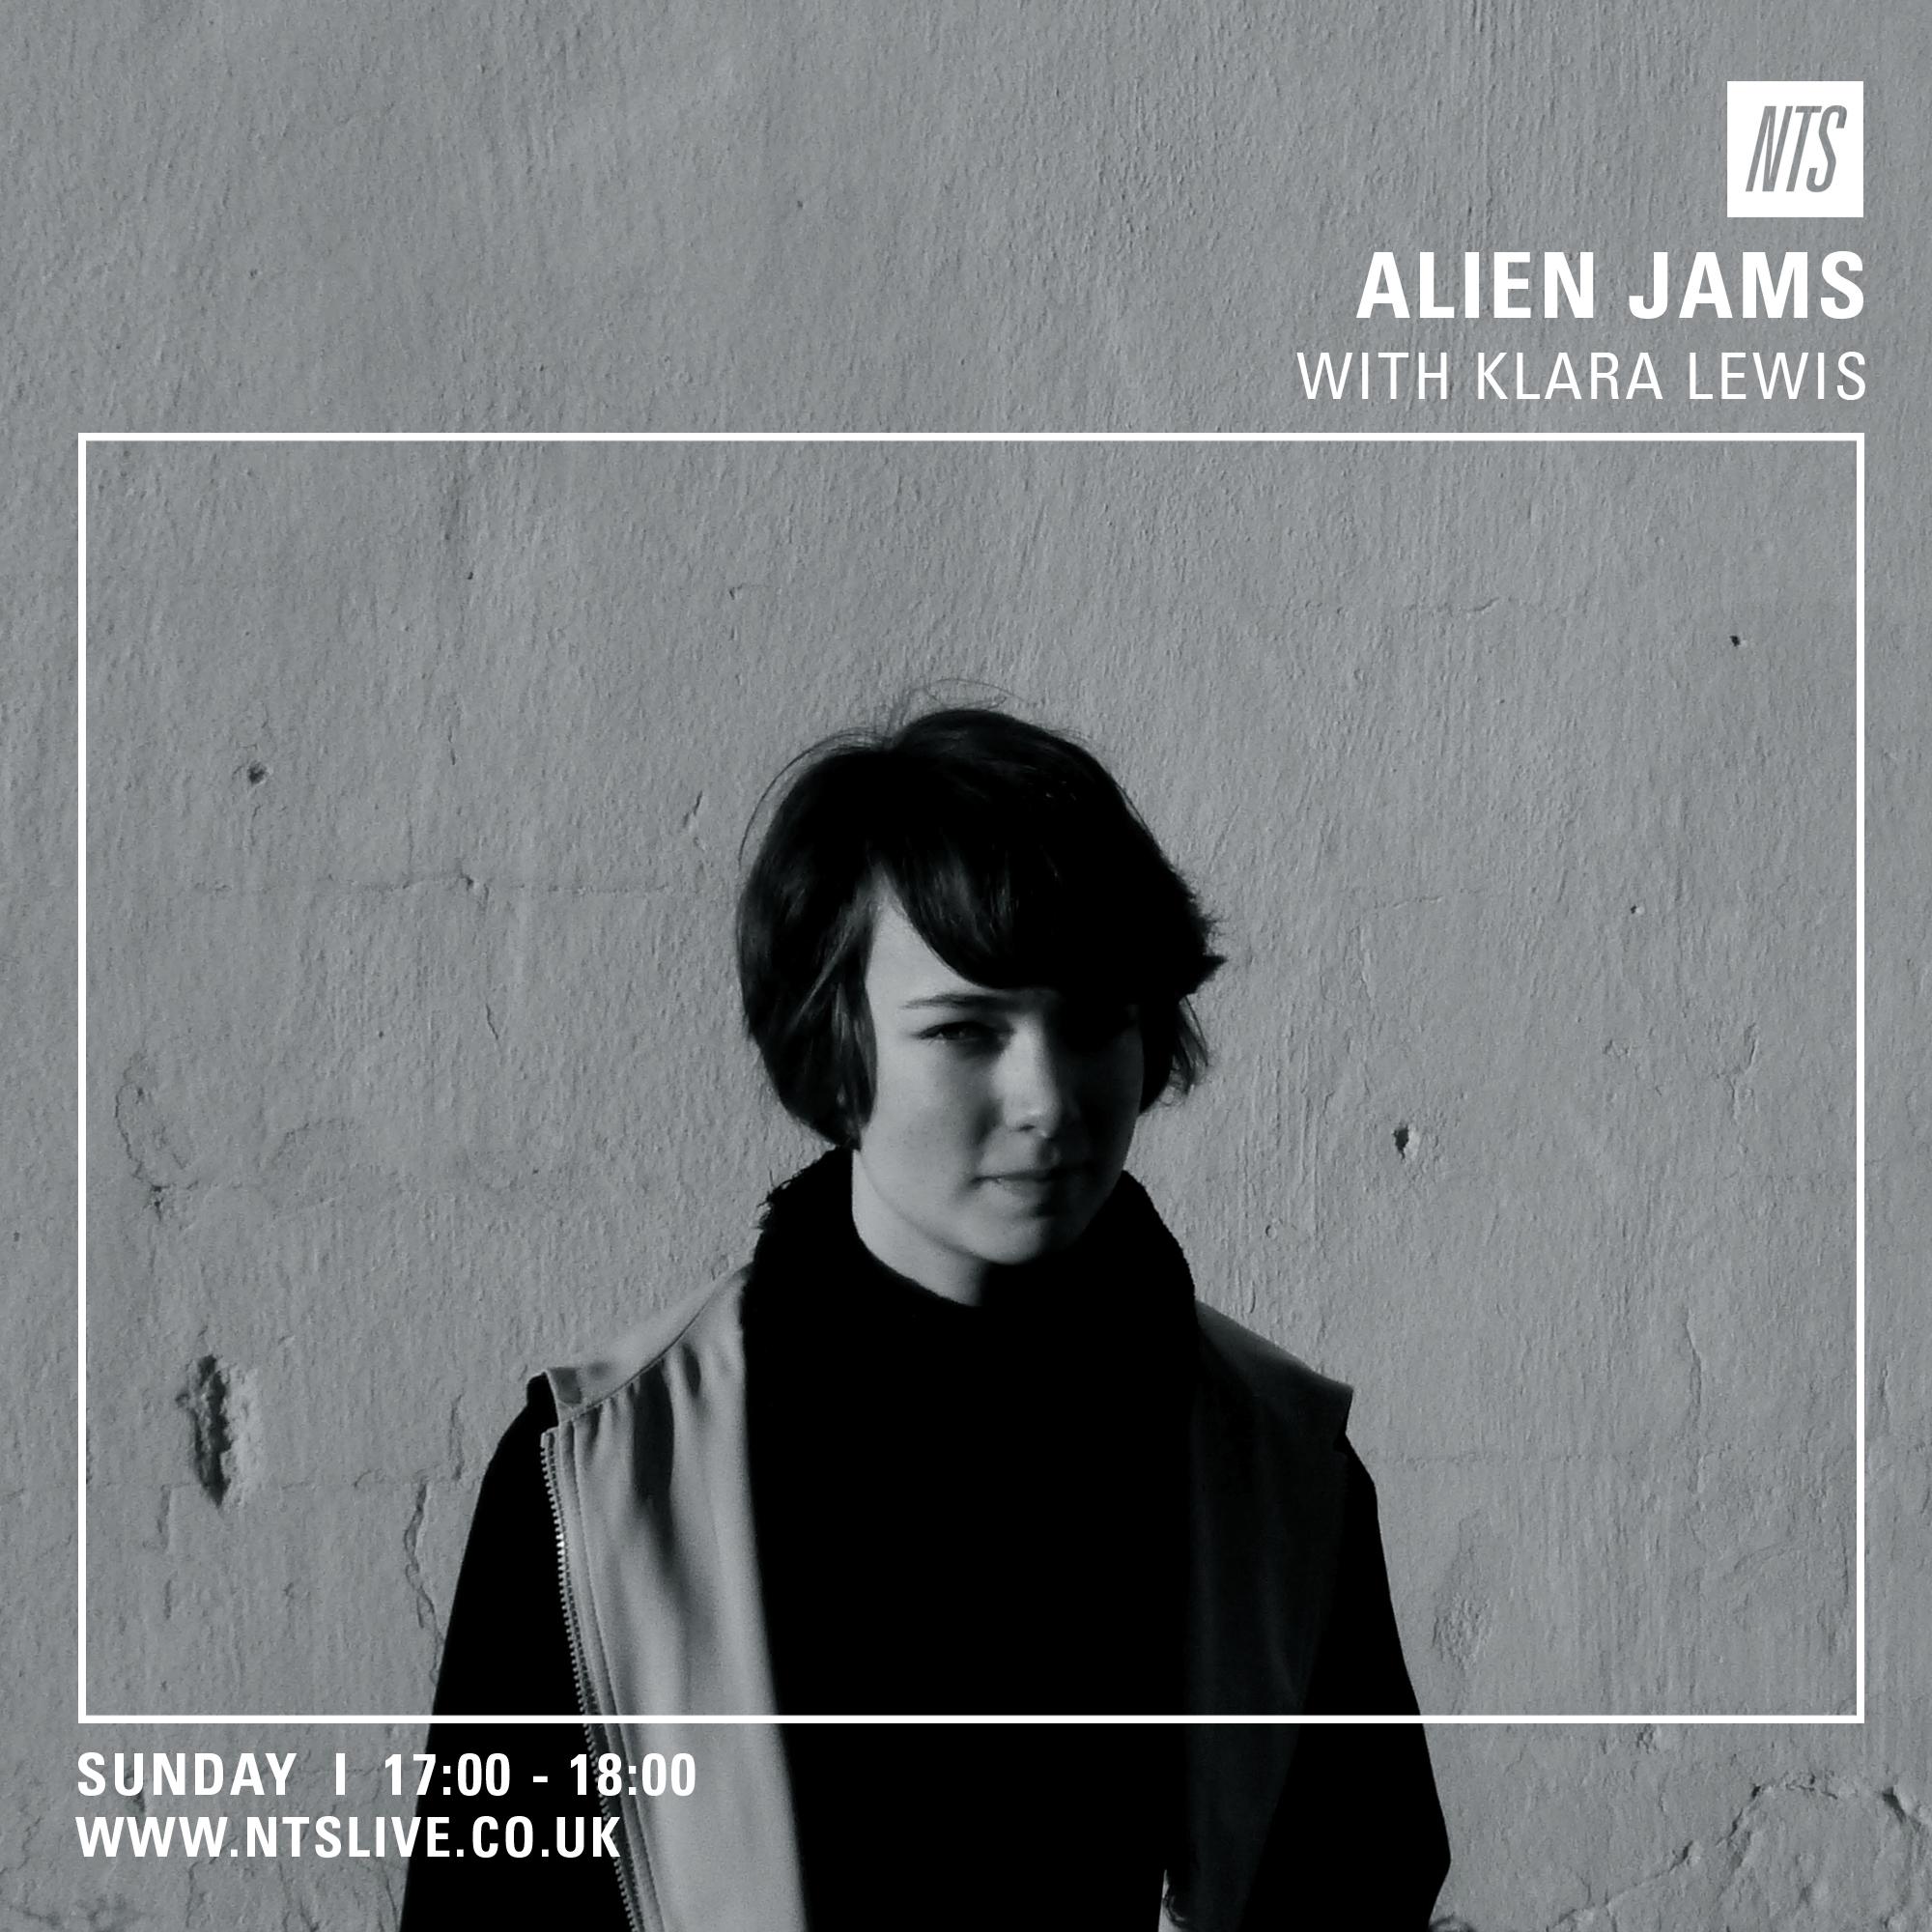 alien jams with klara lewis (2)